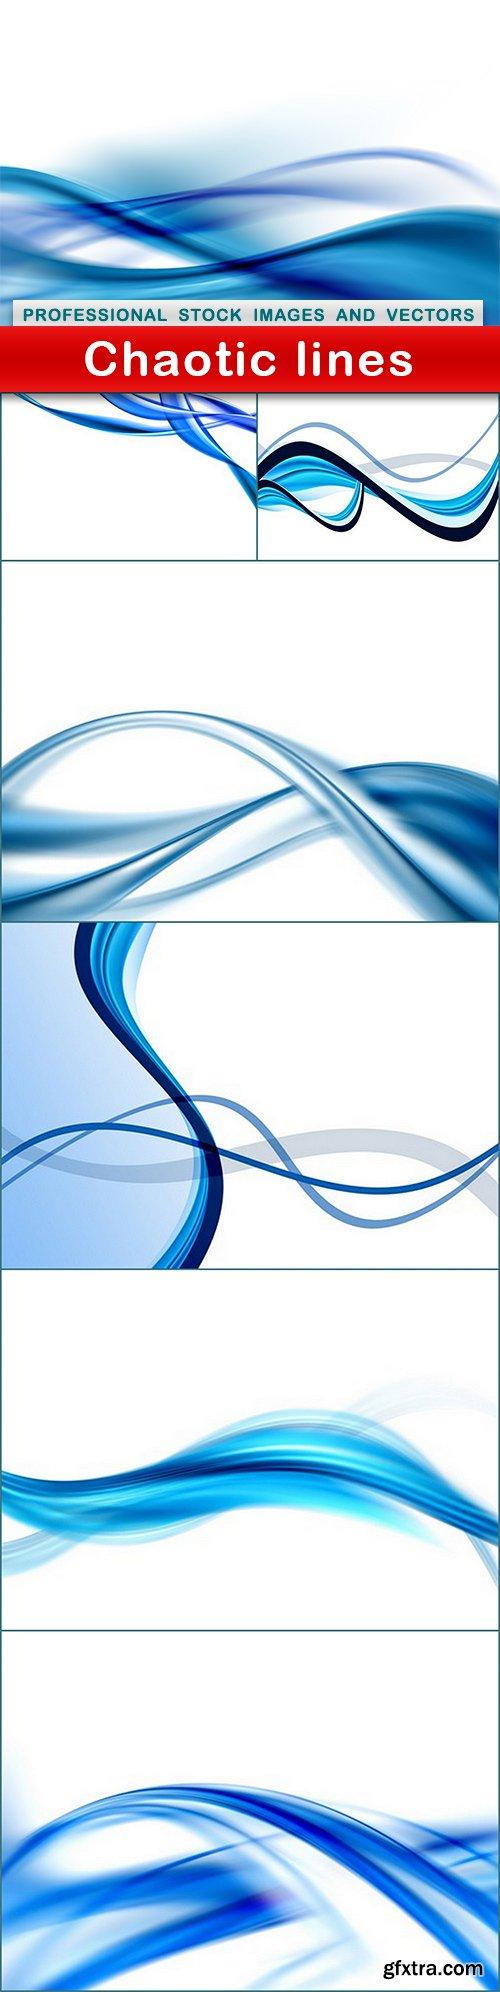 Chaotic lines - 7 UHQ JPEG